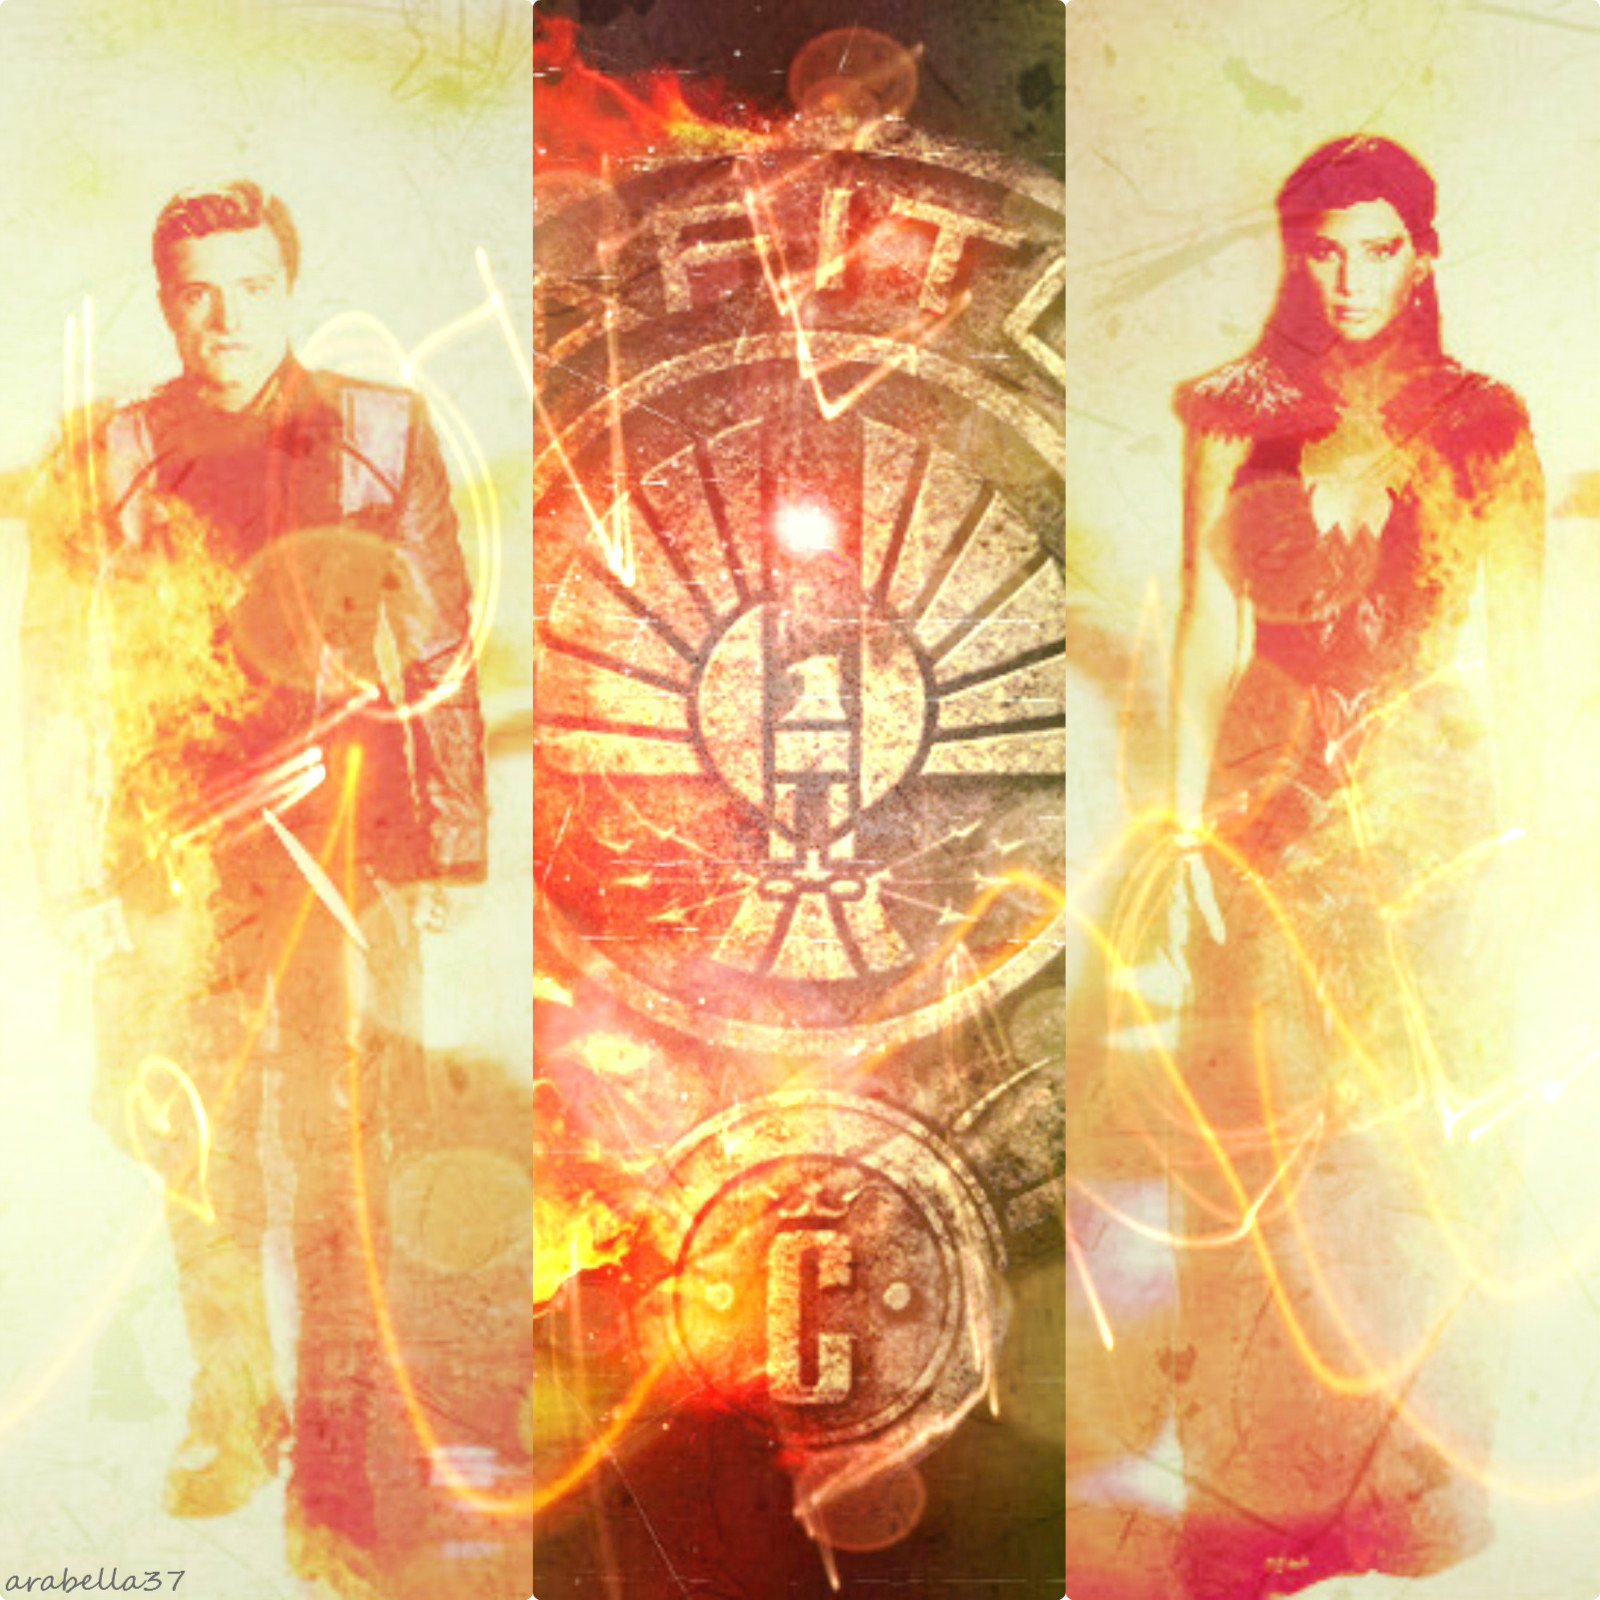 Peeta & Katniss-Catching Fire - The Hunger Games Fan Art